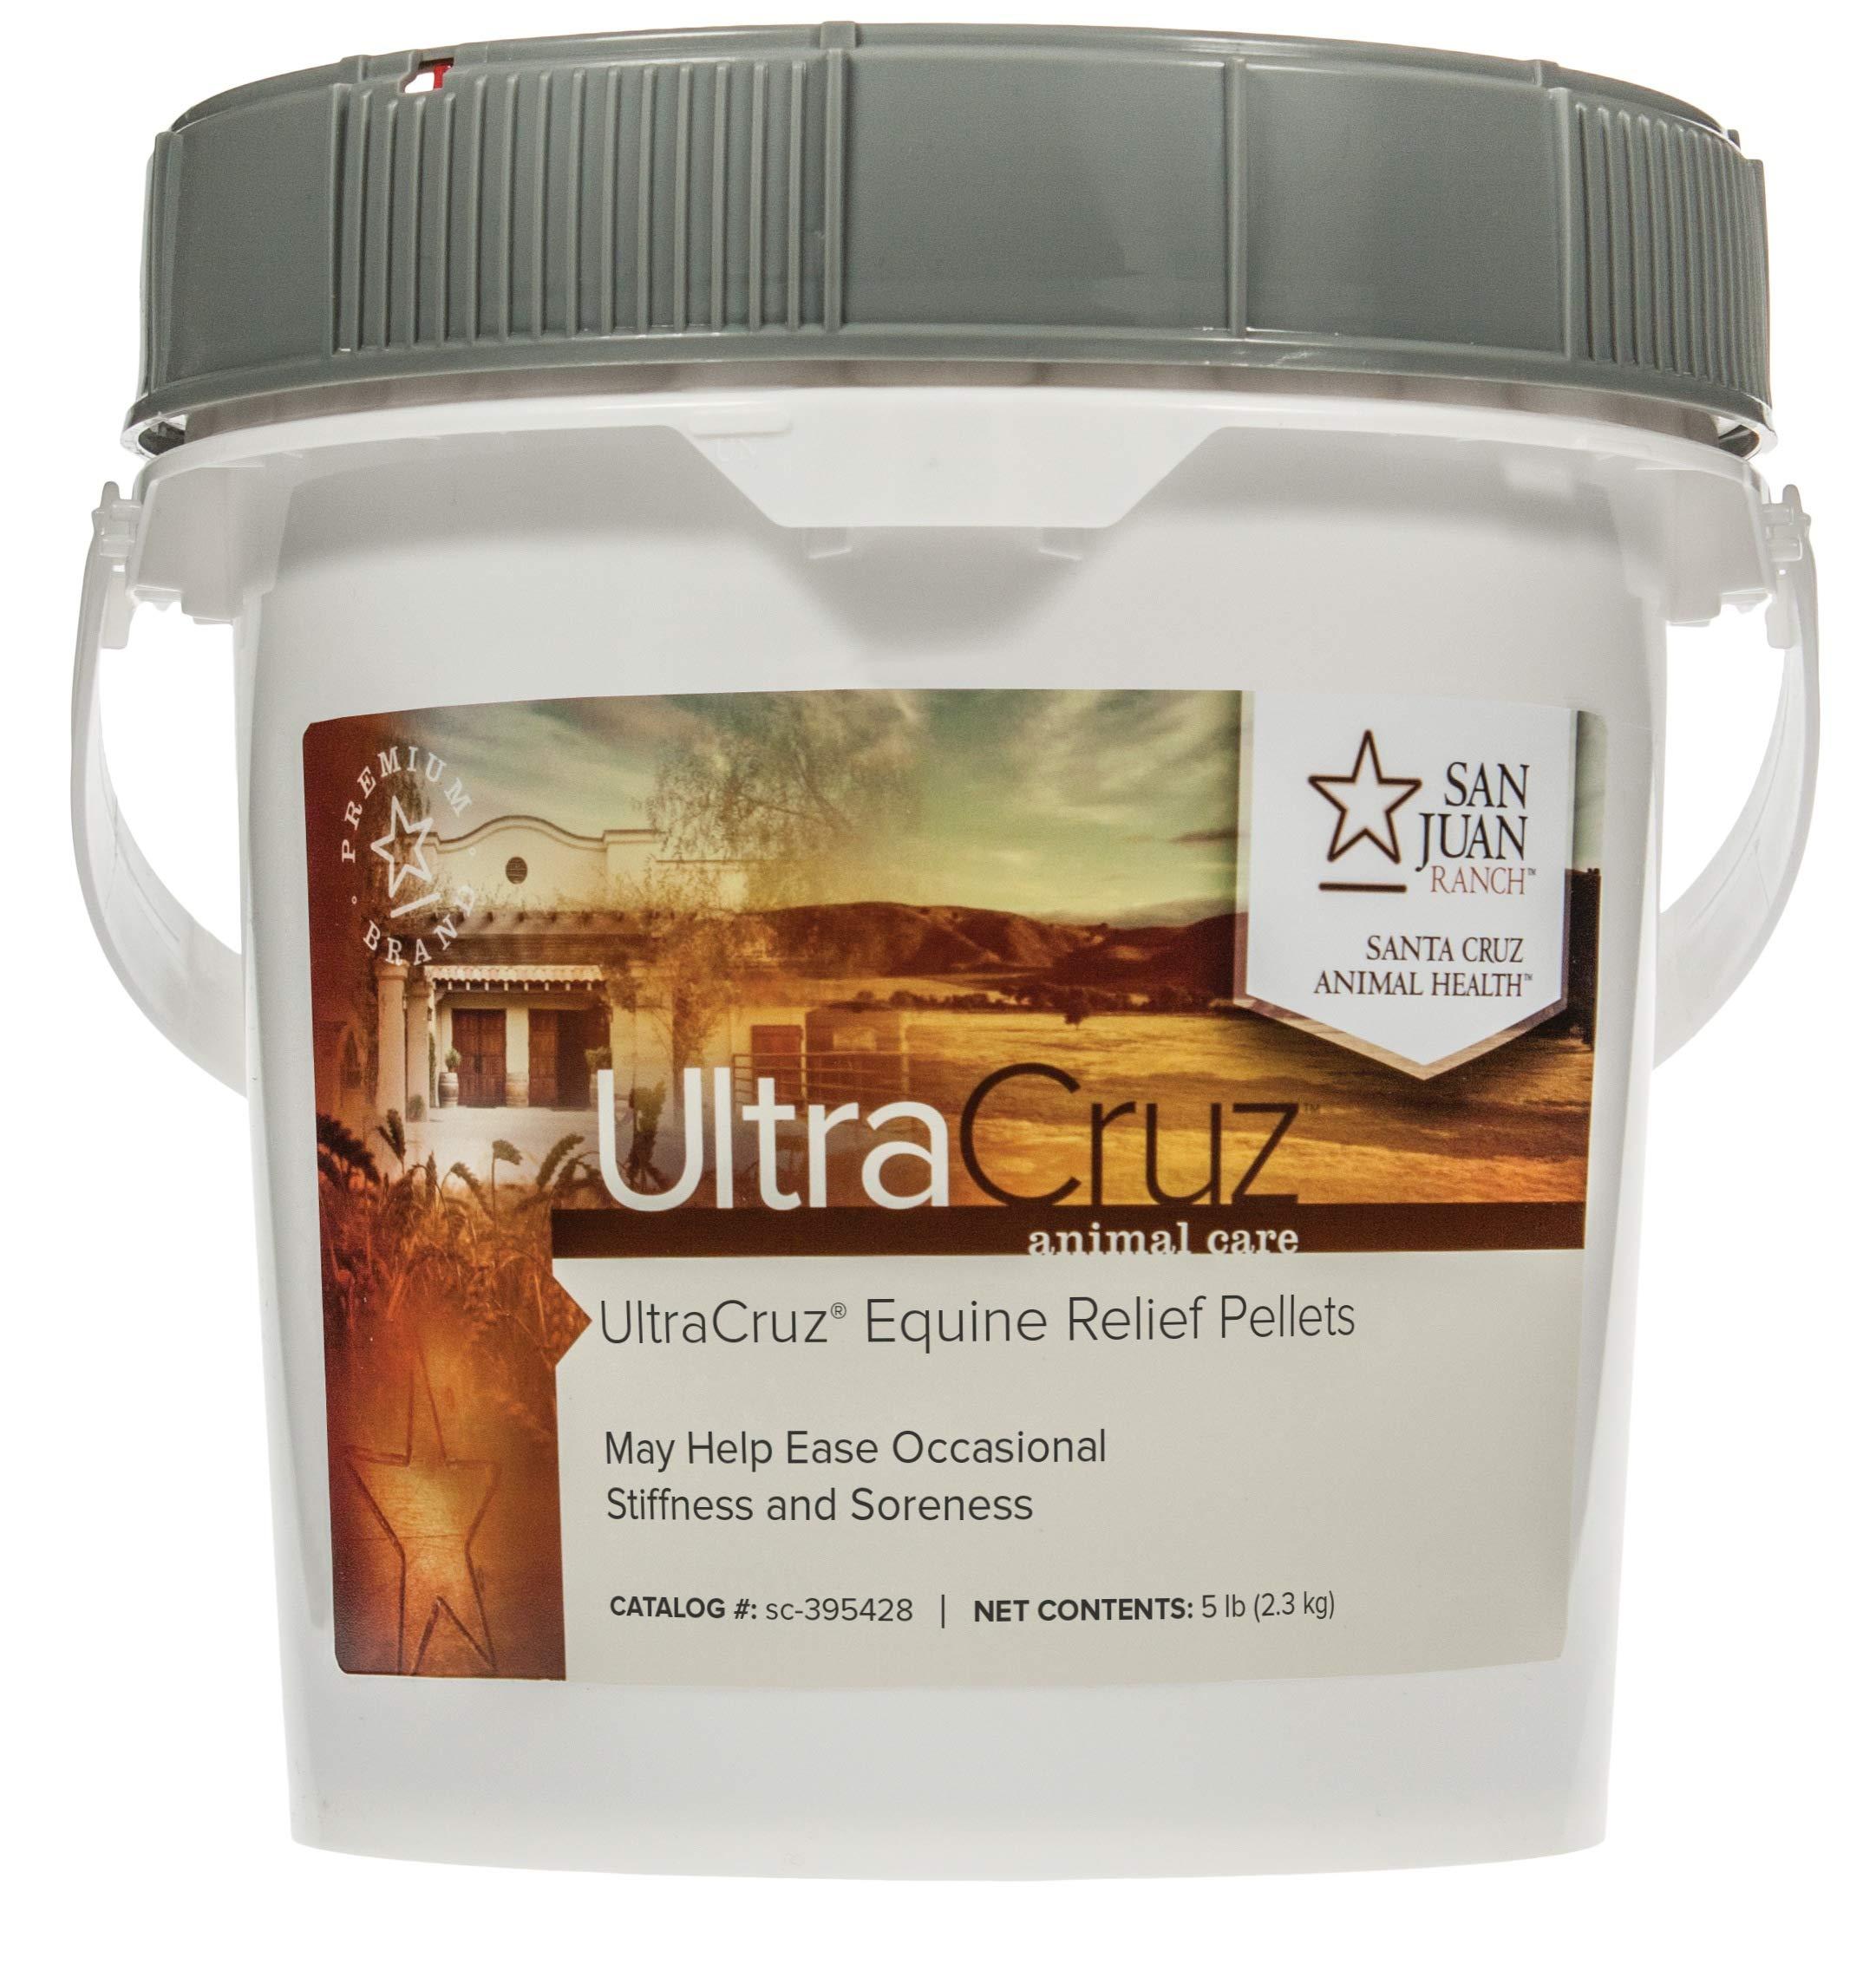 UltraCruz Equine Relief Supplement for Horses, 5 lb, Pellet (80 Day Supply) by UltraCruz